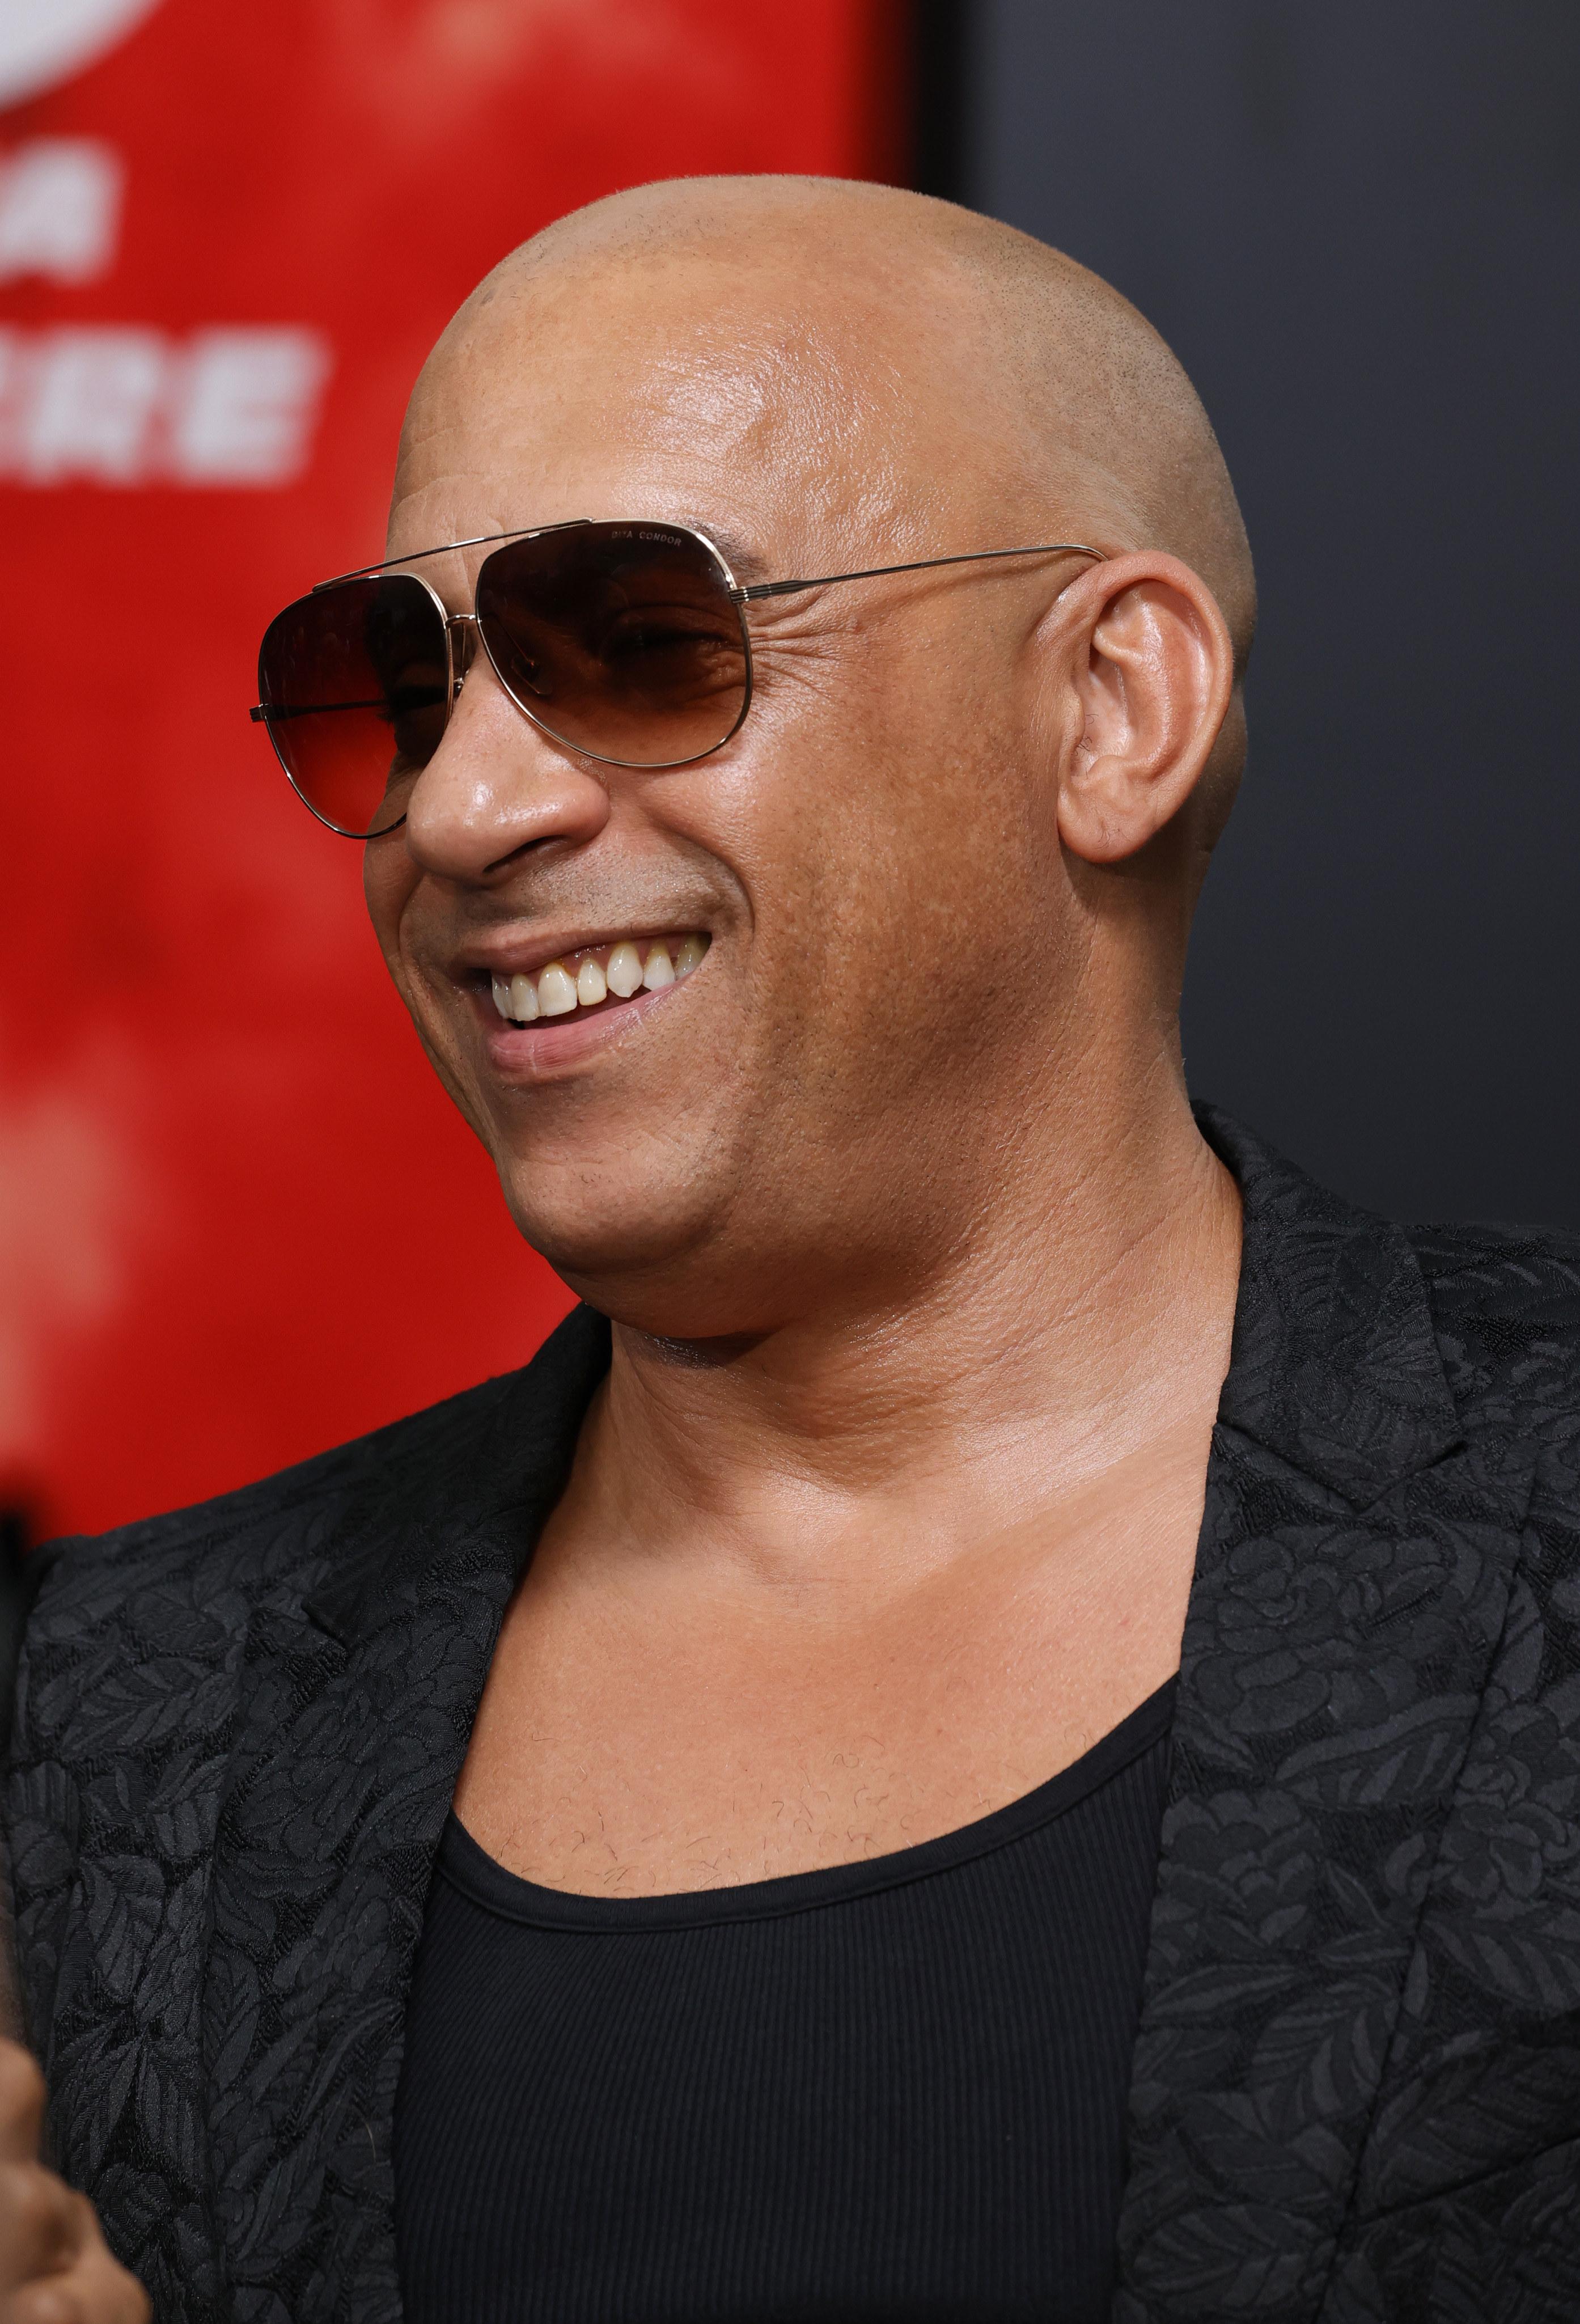 Vin Diesel on the red carpet wearing sunglasses